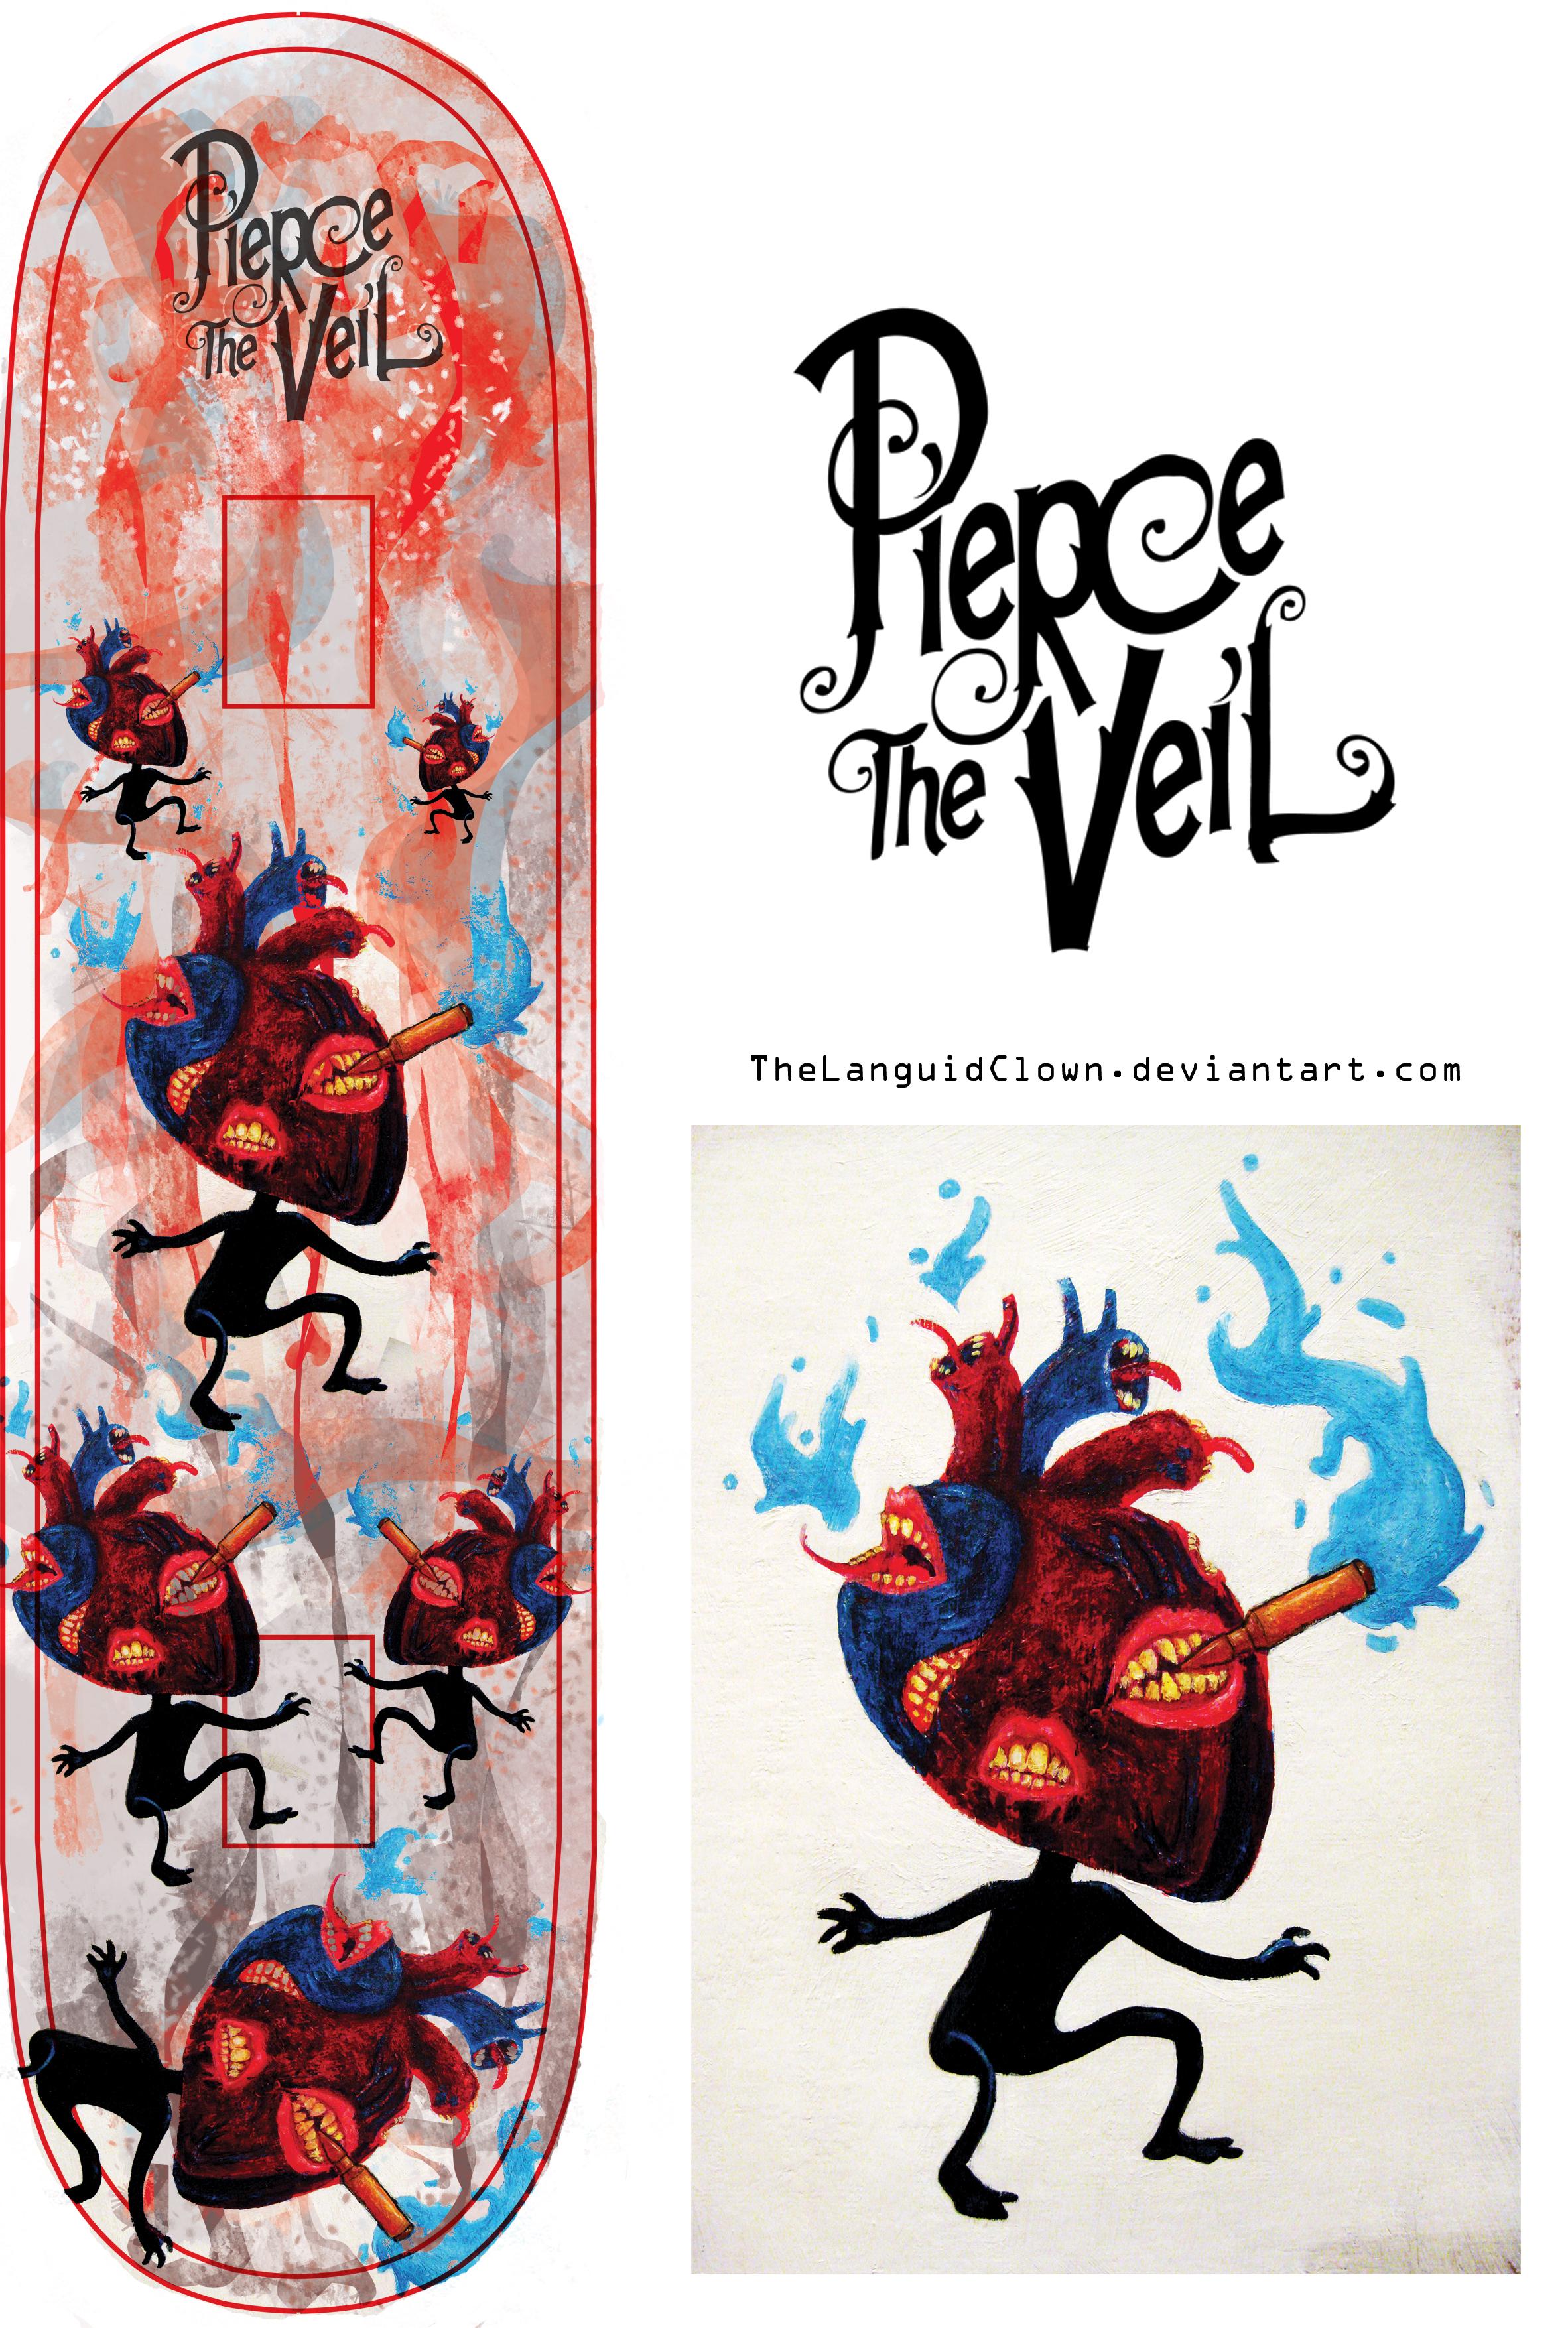 Pierce The Veil: Bulletproof Love by TheLanguidClown